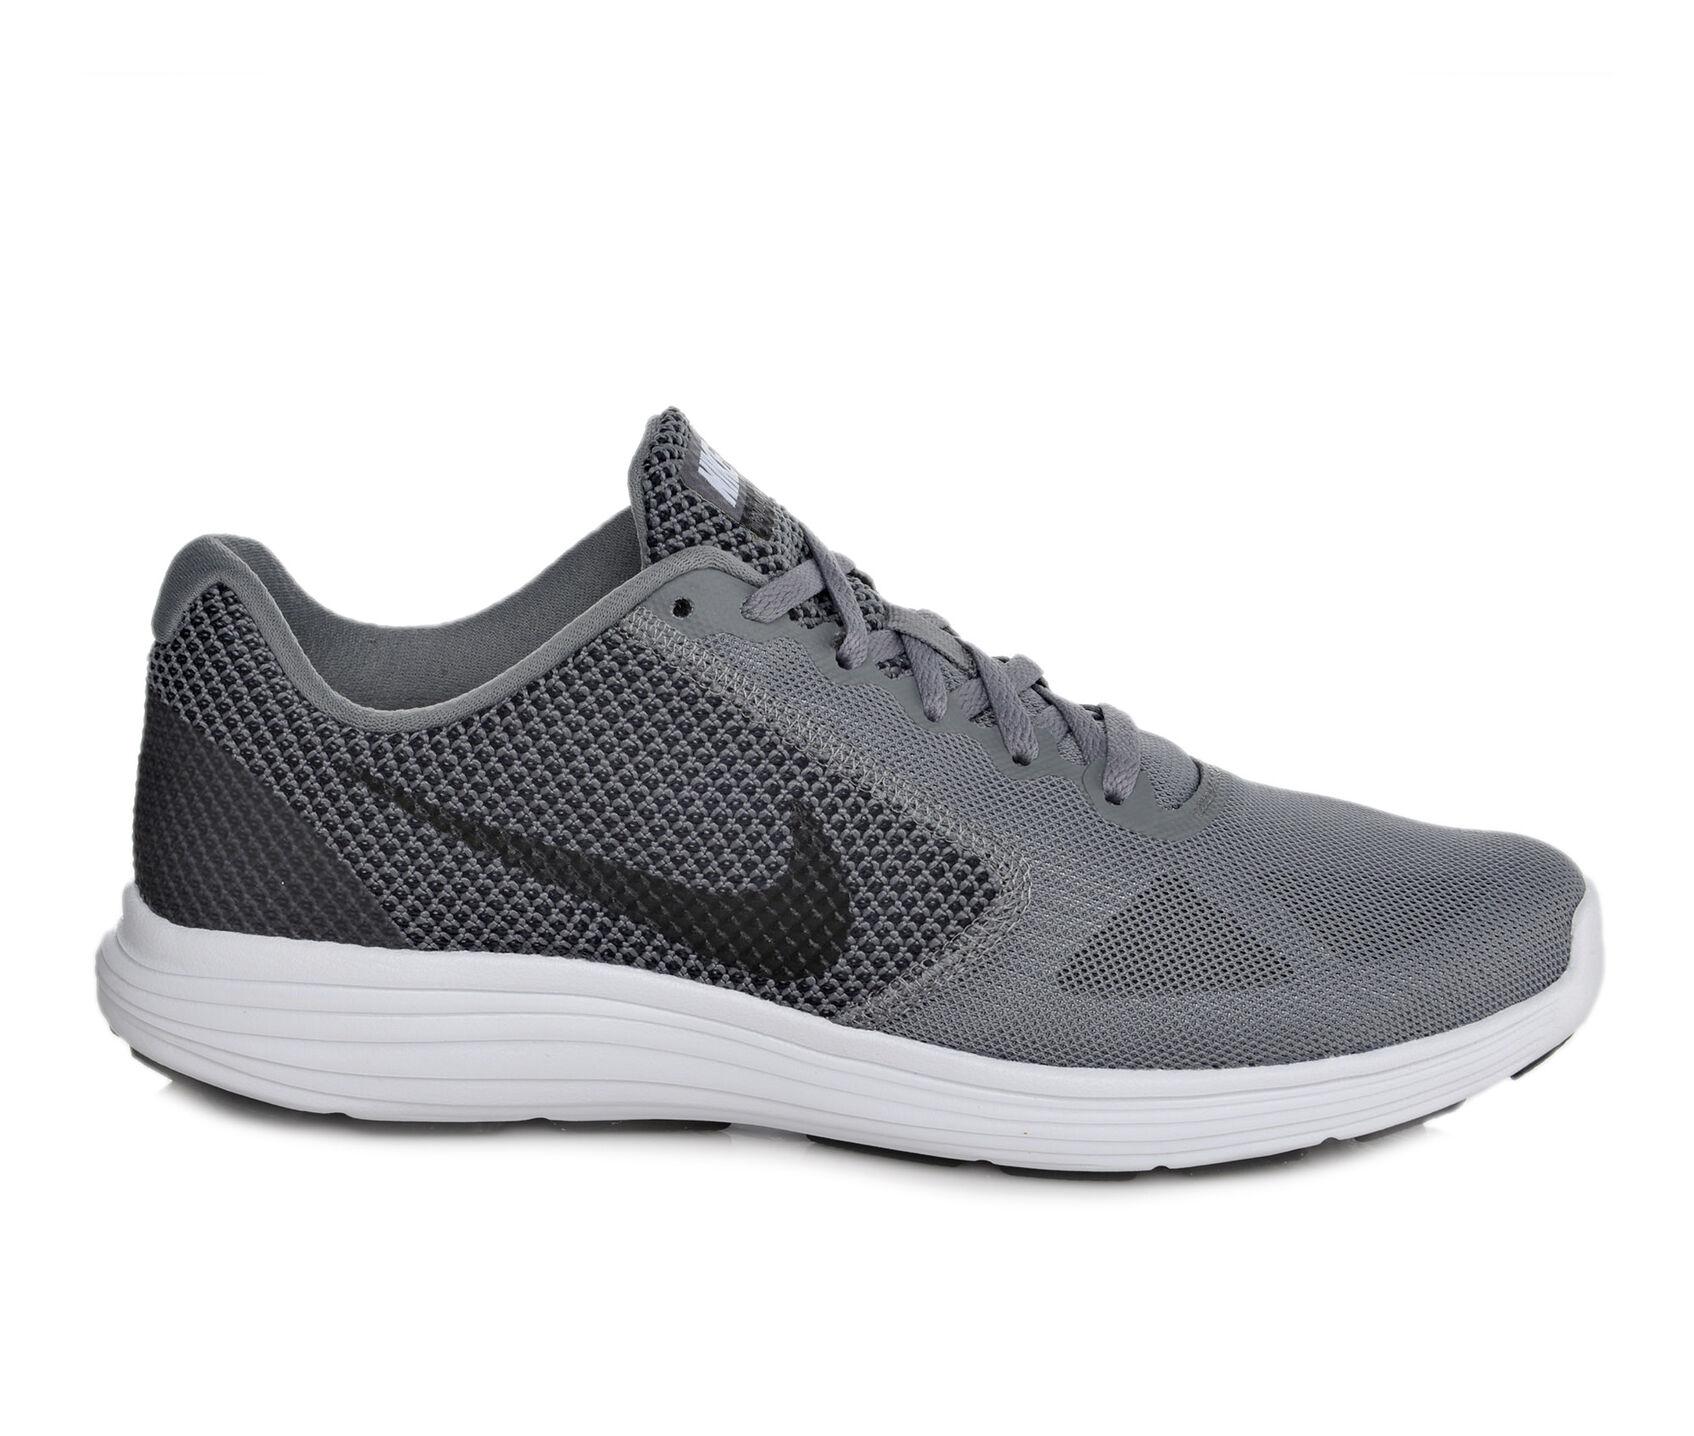 Newton Running Shoes Denver